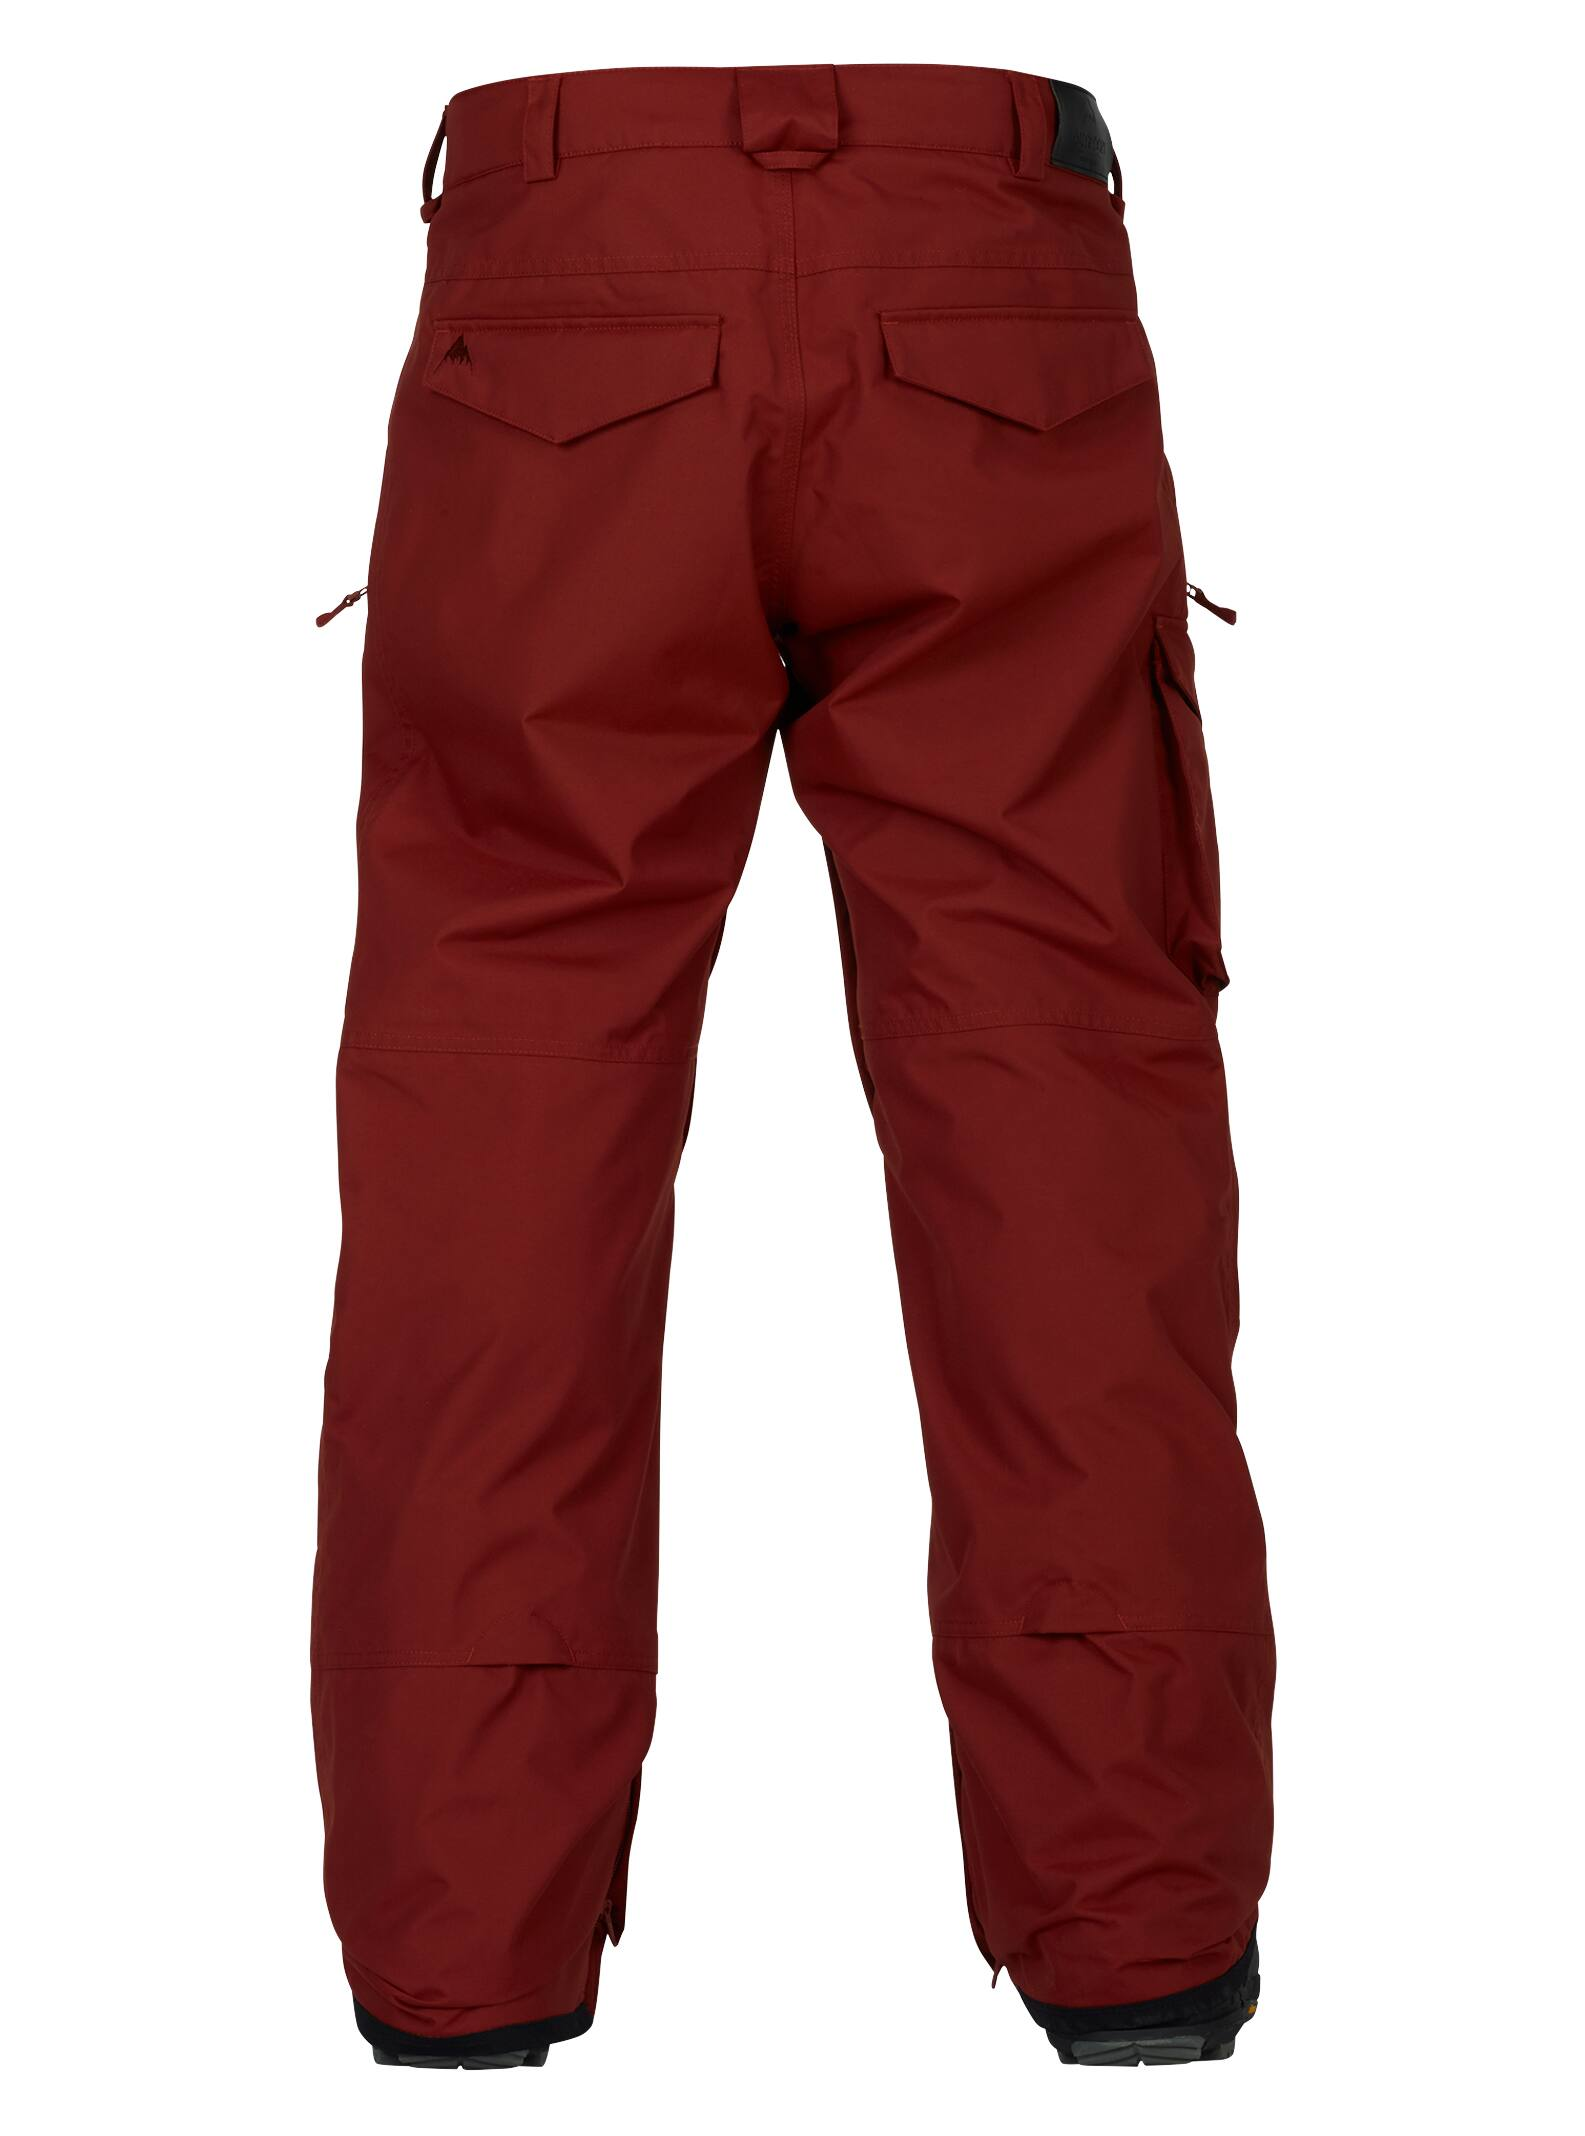 ac949a9b24d7 Men's Burton Covert Pant | Burton Snowboards Winter 2018